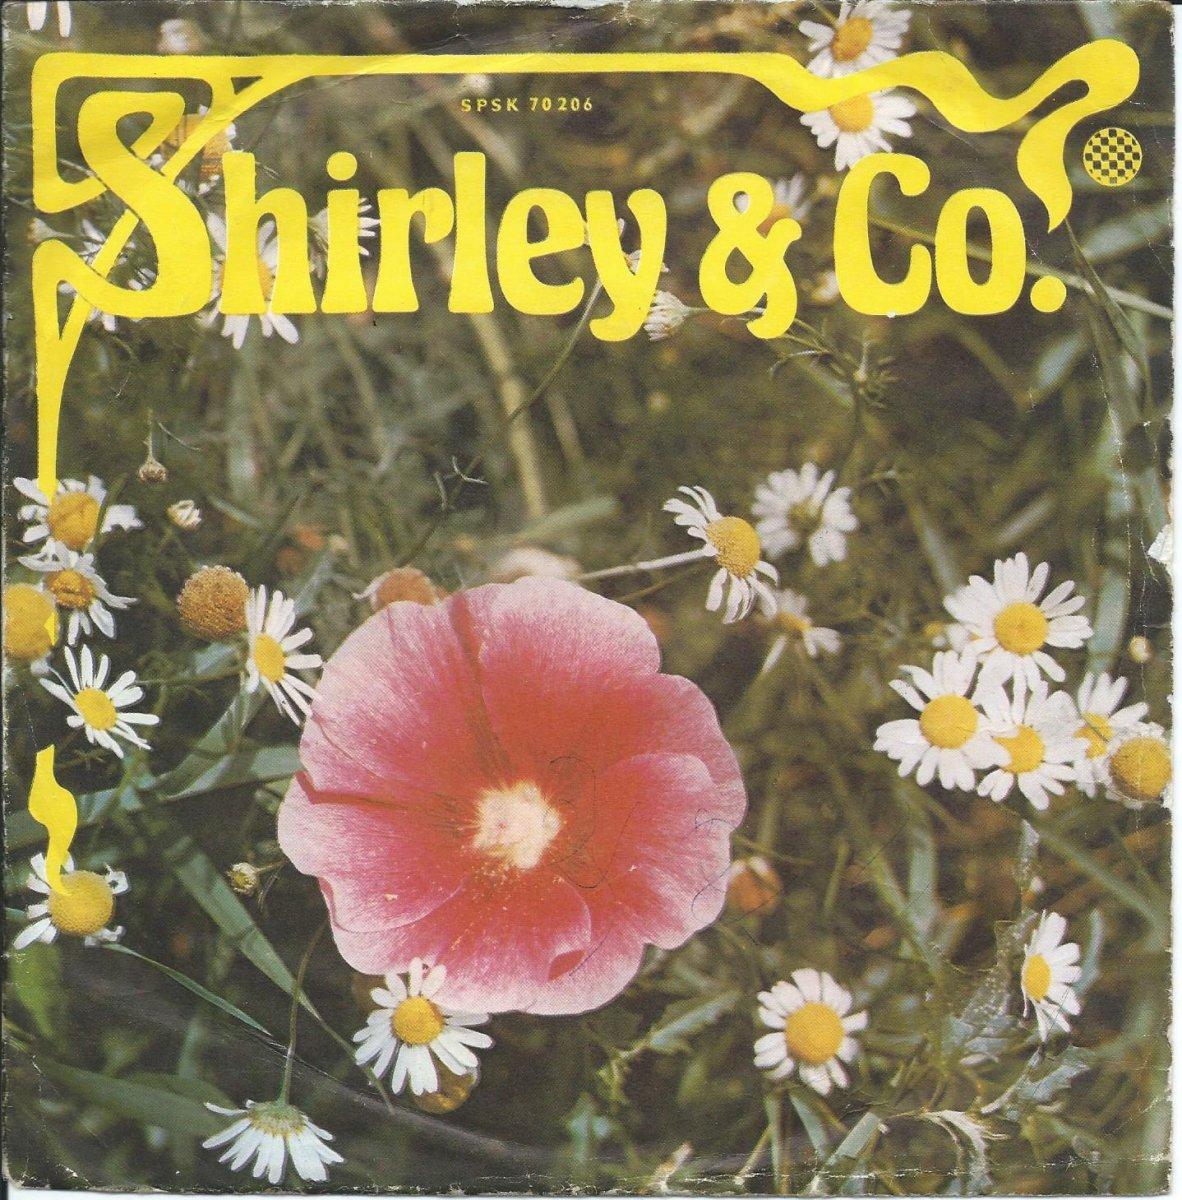 SHIRLEY AND COMPANY / SHAME, SHAME, SHAME (7